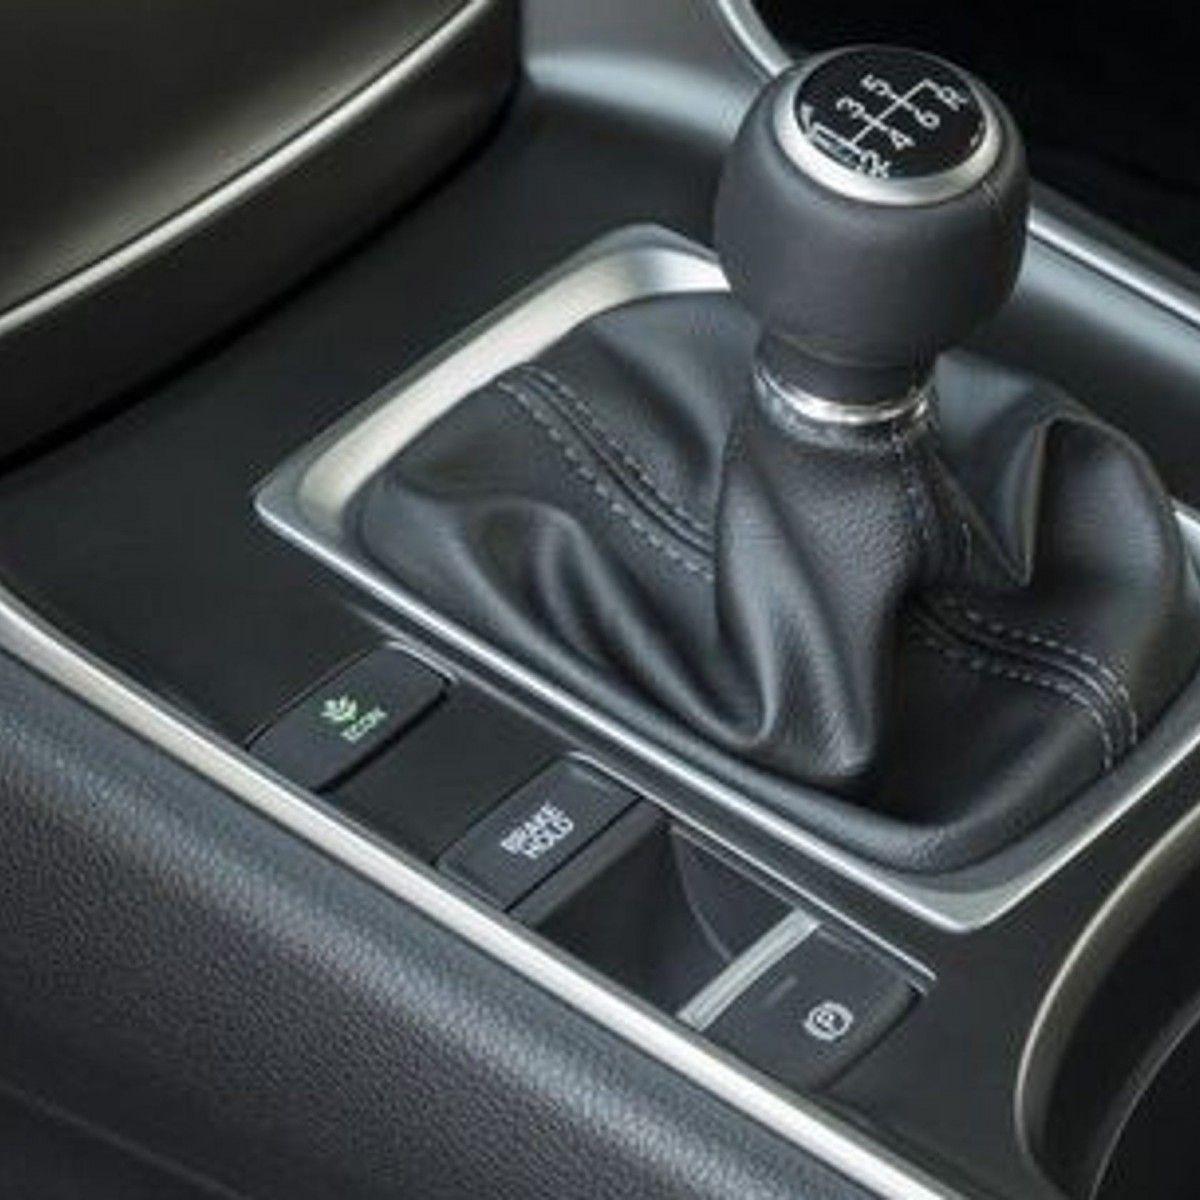 Suvs Manual Transmission Fresh Stick Shifts Edmunds Offers